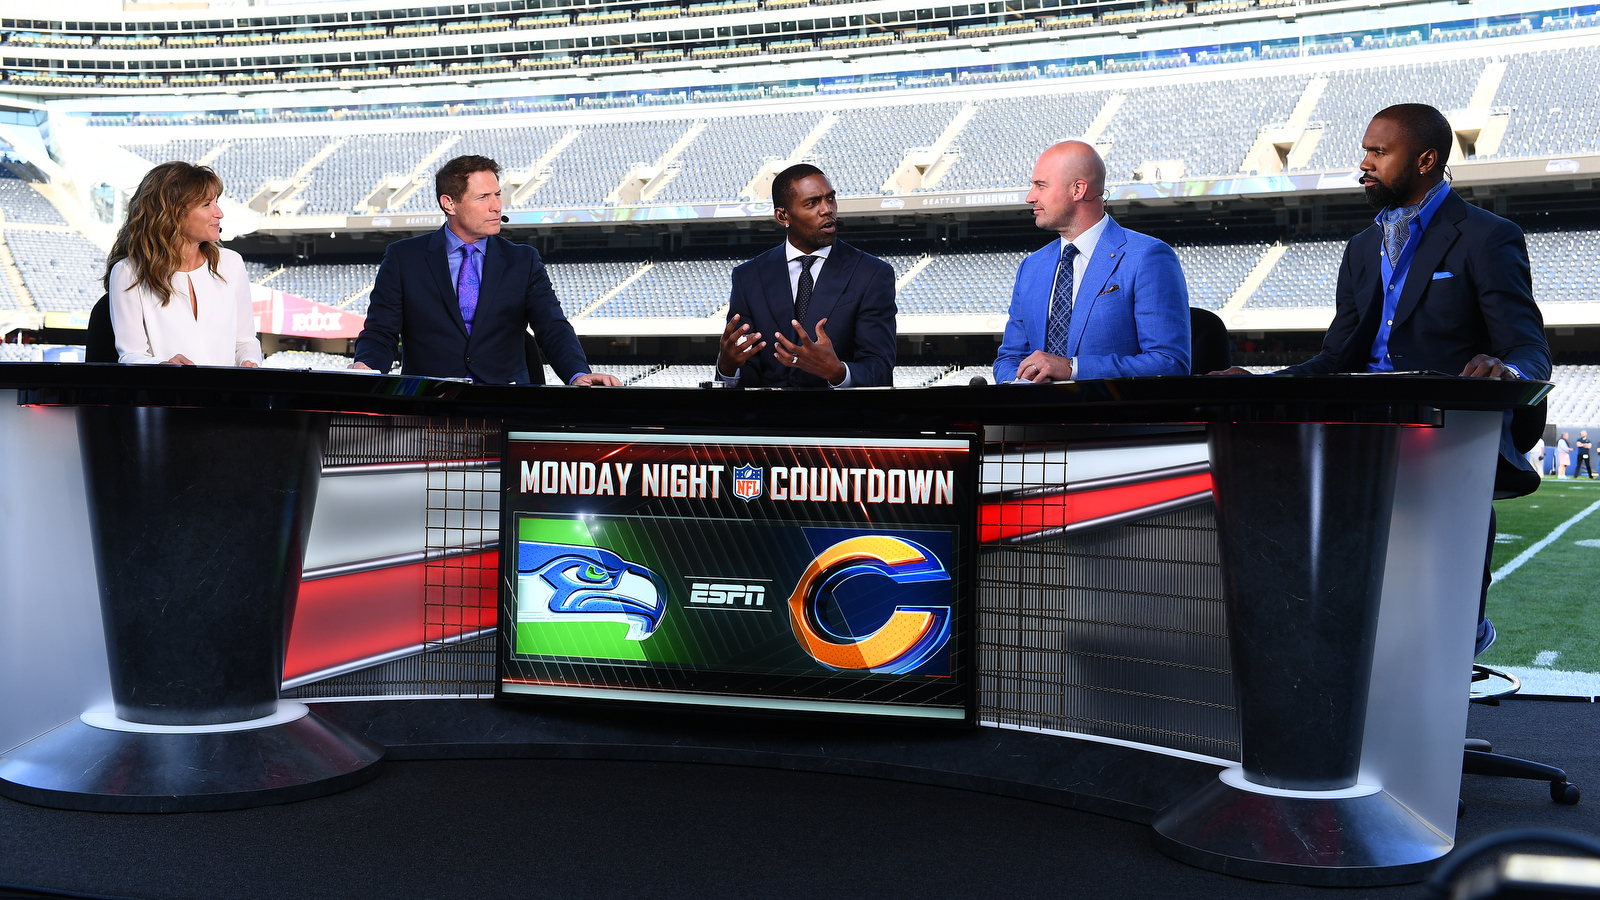 NCS_ESPN-NFL-Monday-Night-Countdown-0009